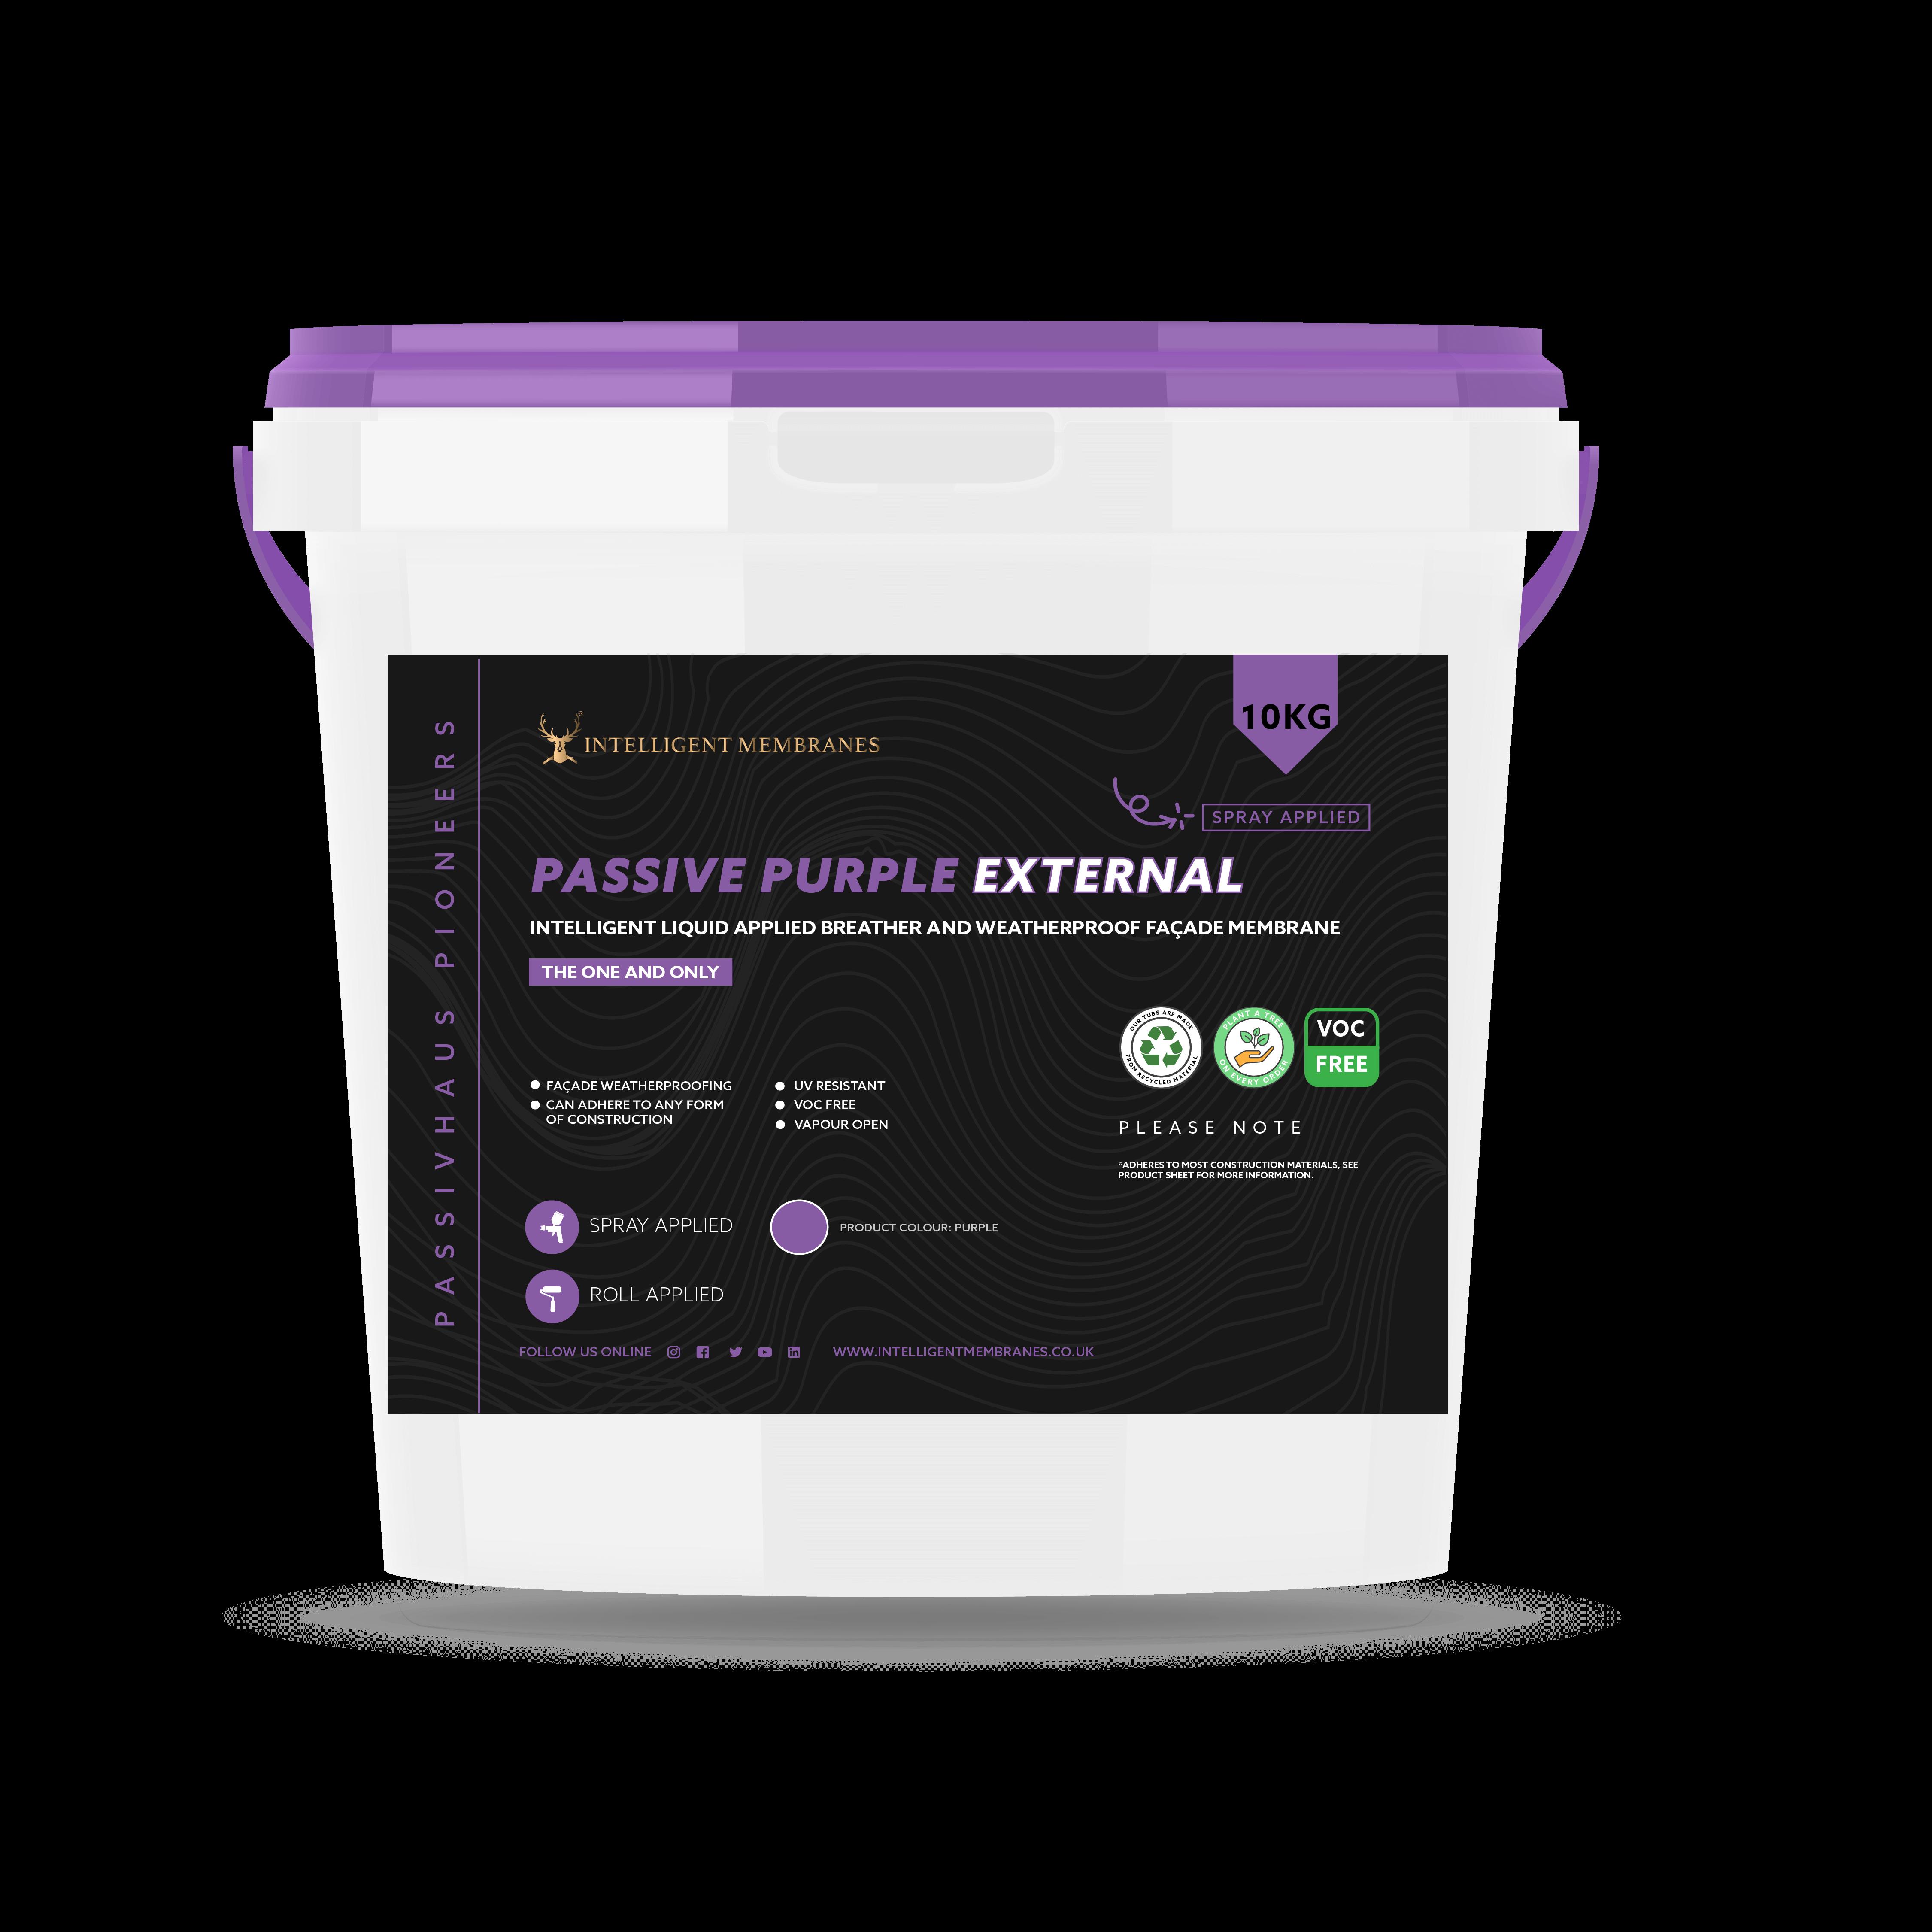 Passive Purple External - a facade waterproofing membrane